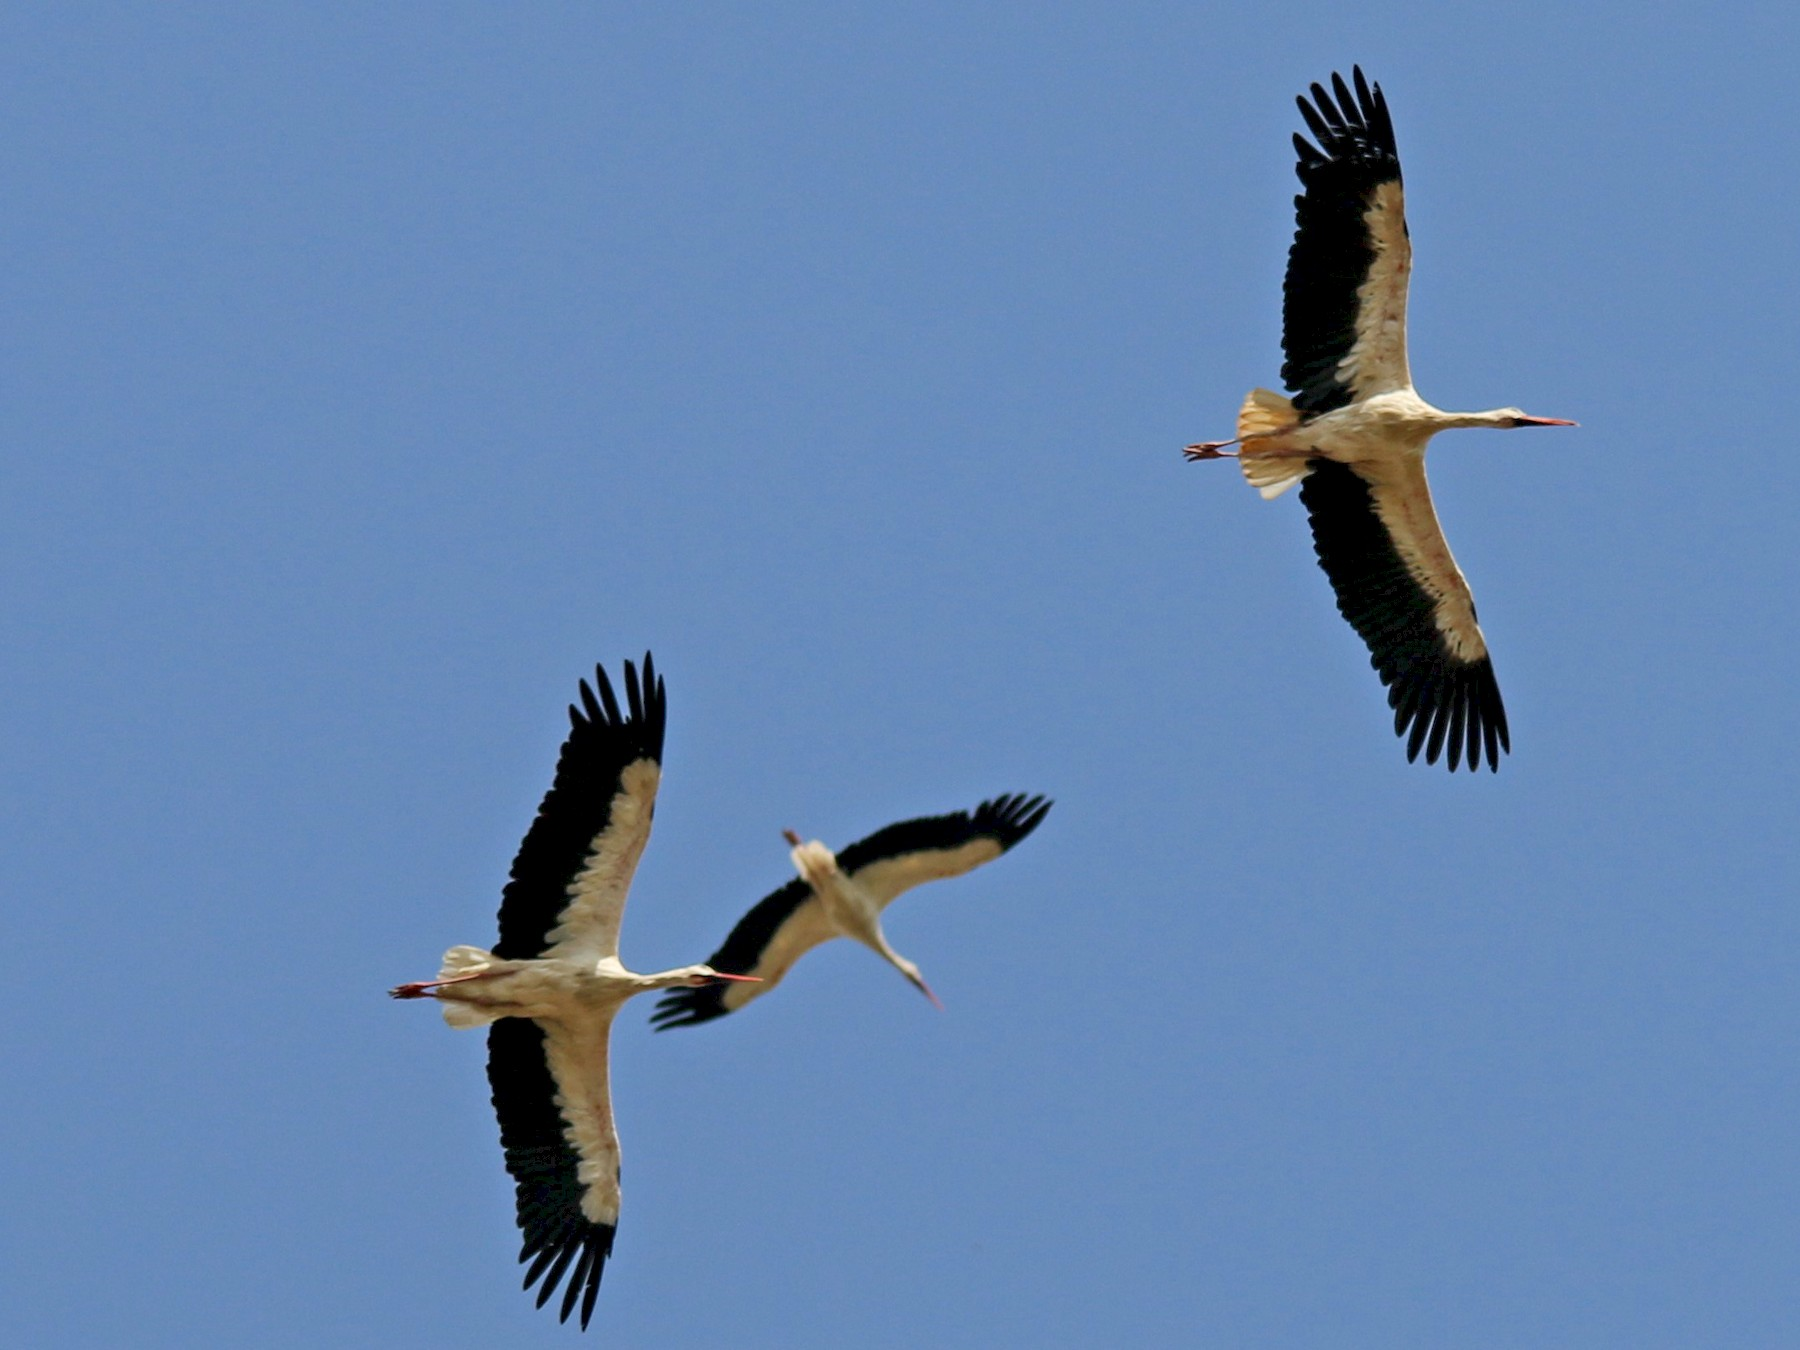 White Stork - Alexandre Hespanhol Leitão